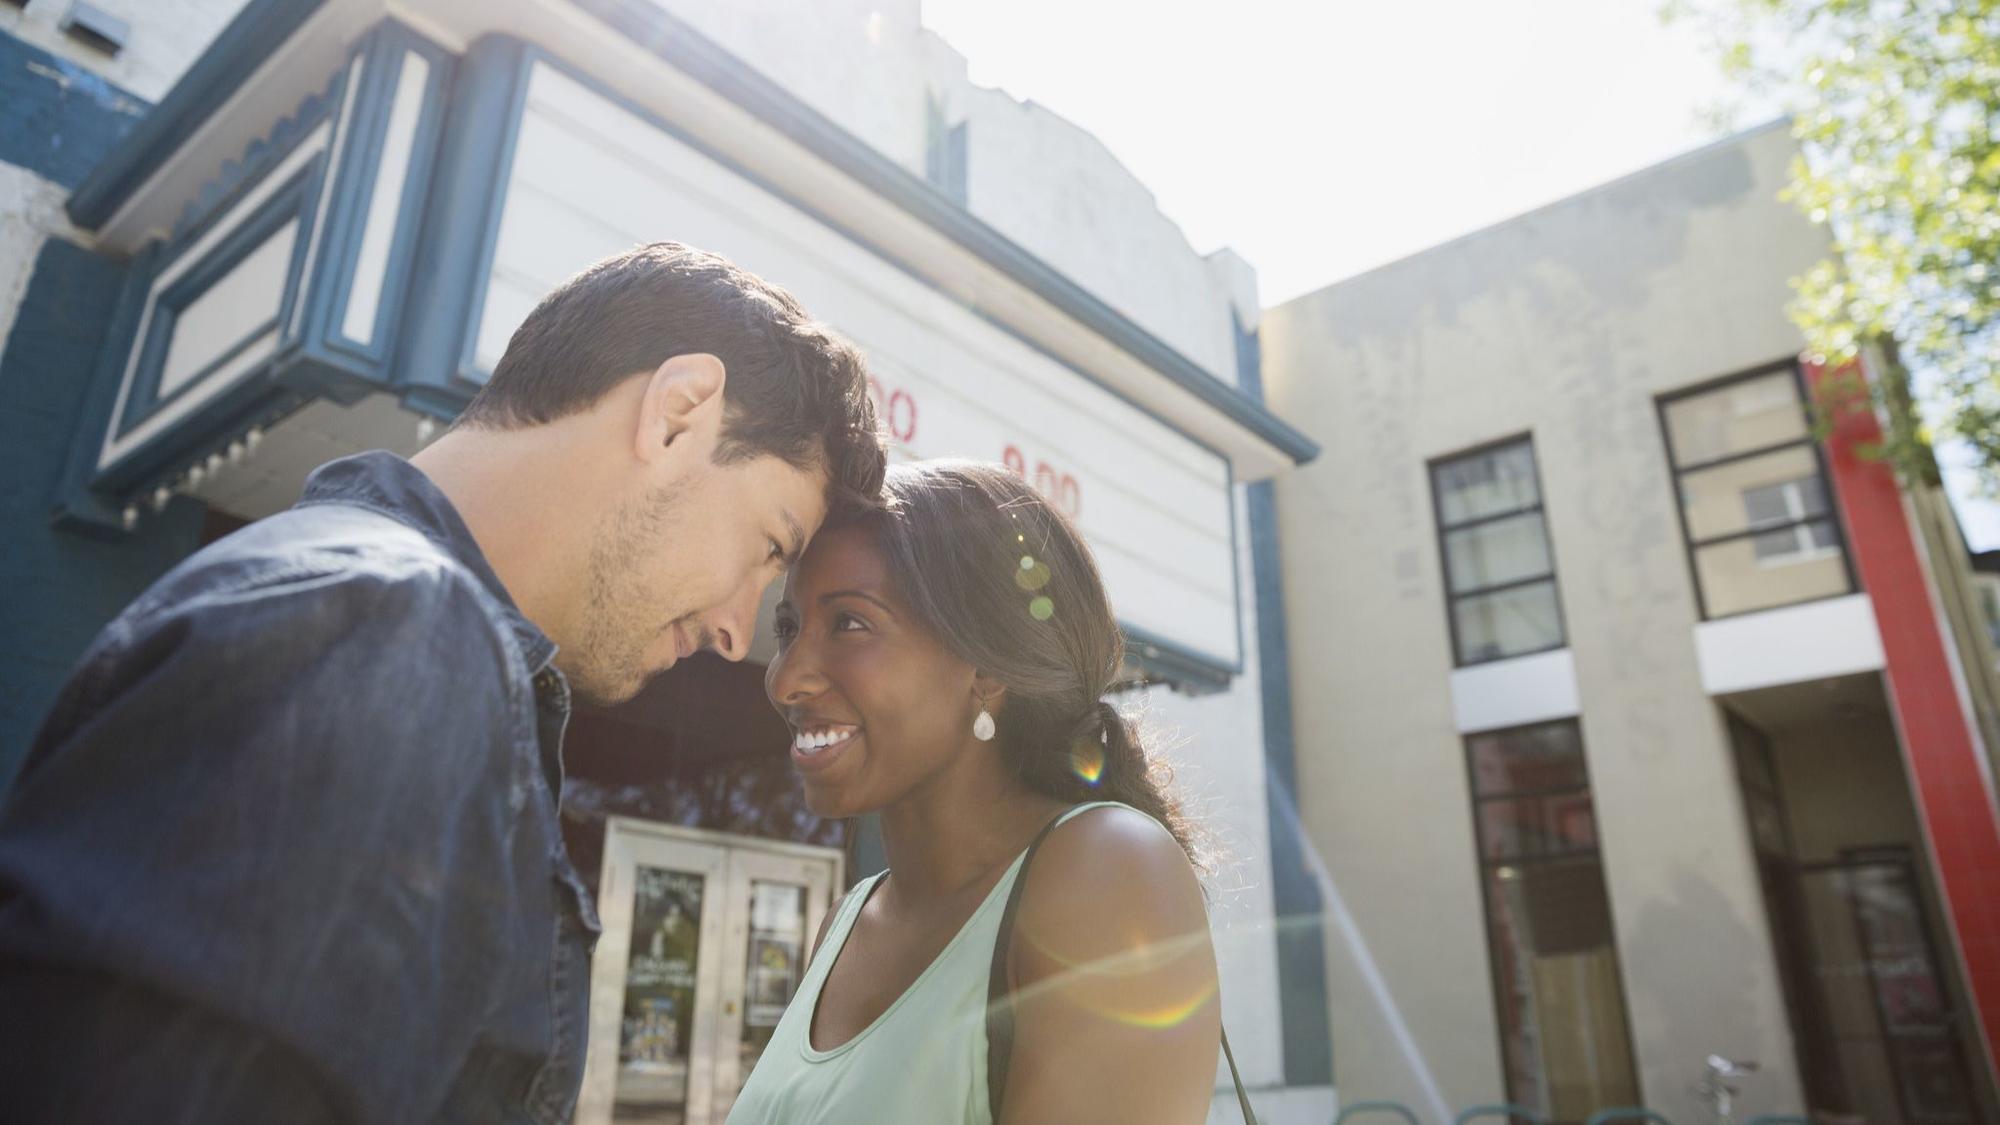 Singles dating sites in switzerland